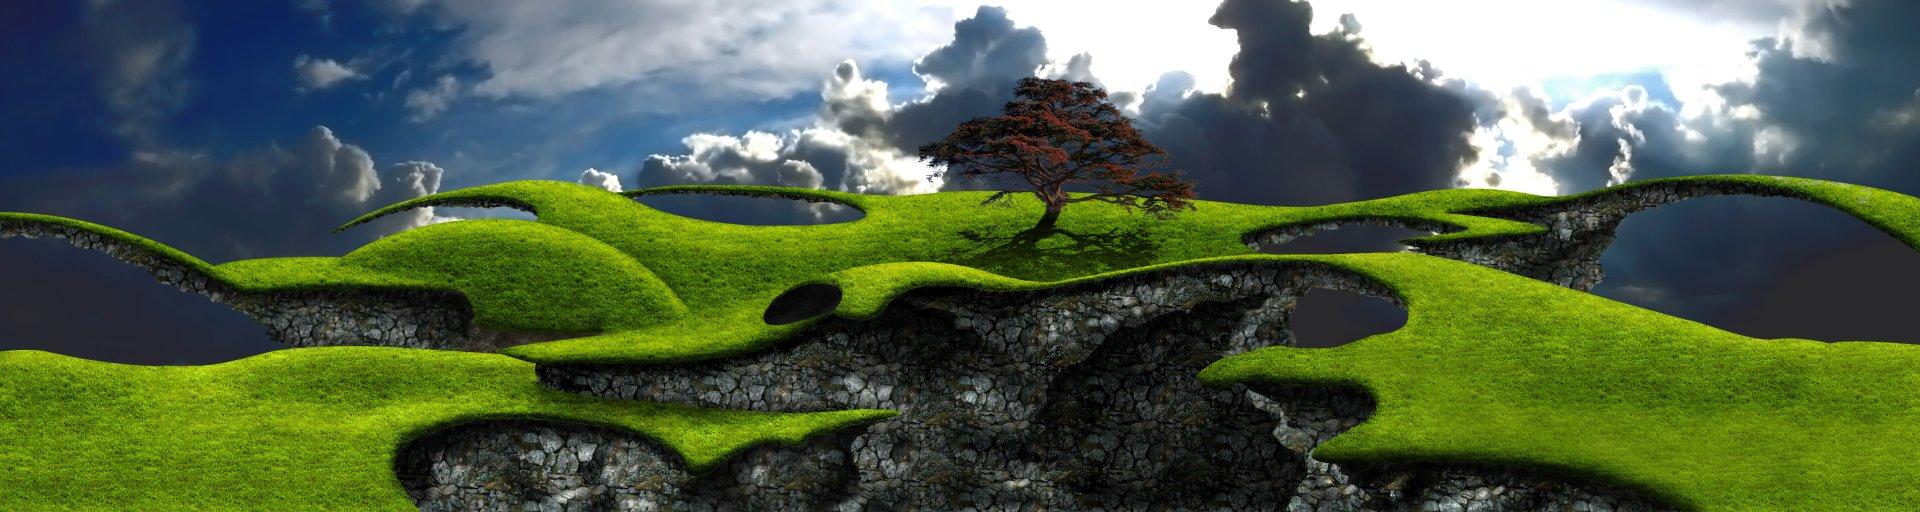 Fantasy - Landschaft  Baum Wallpaper